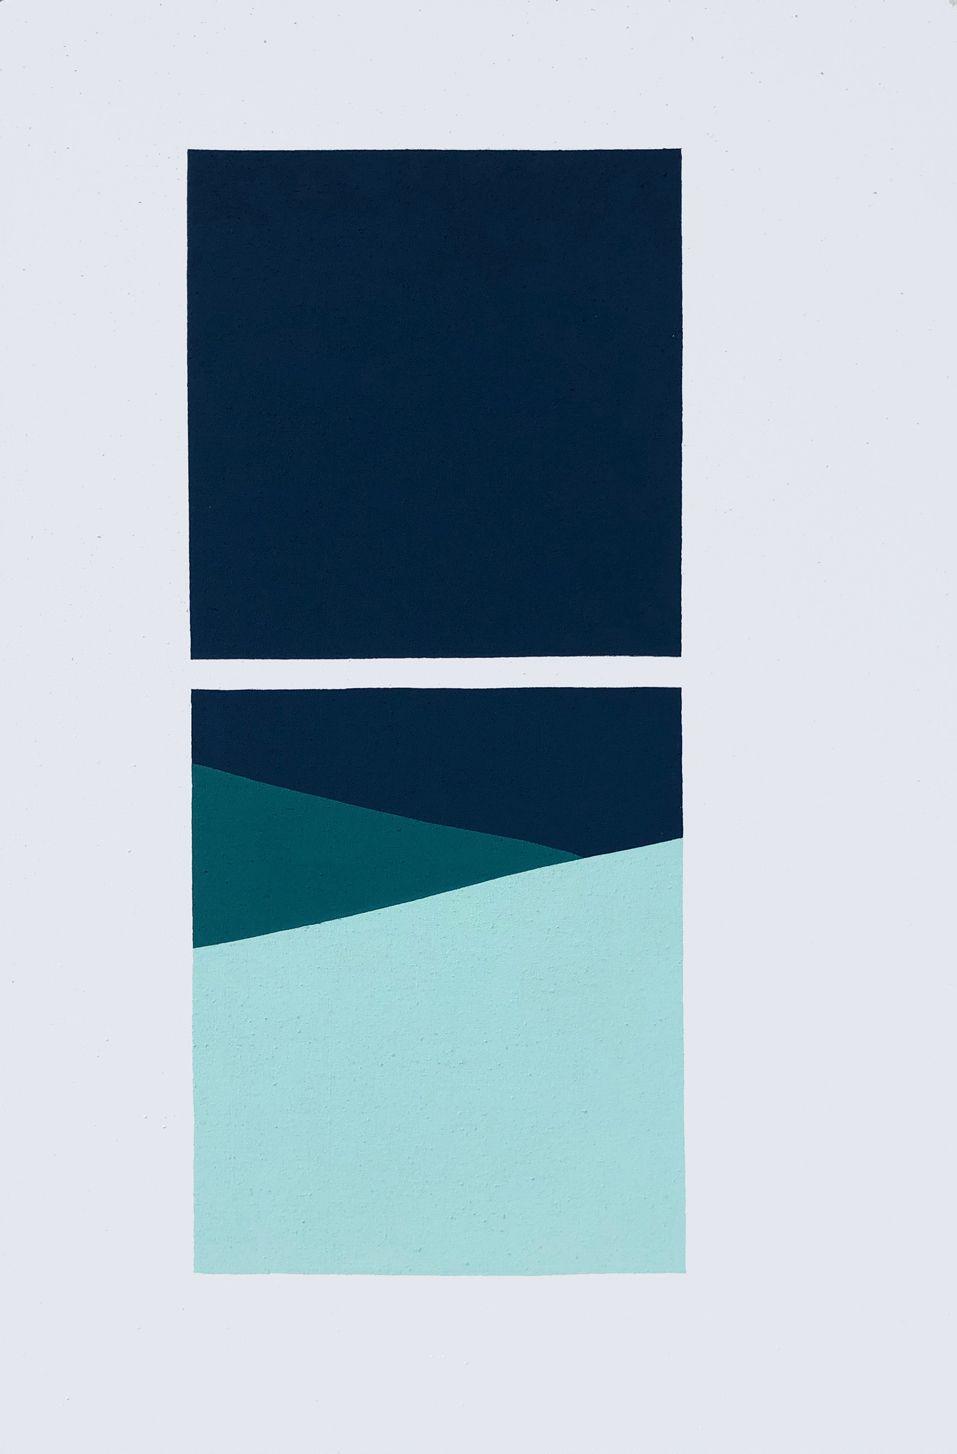 Paul Kremer Window 15, 2019